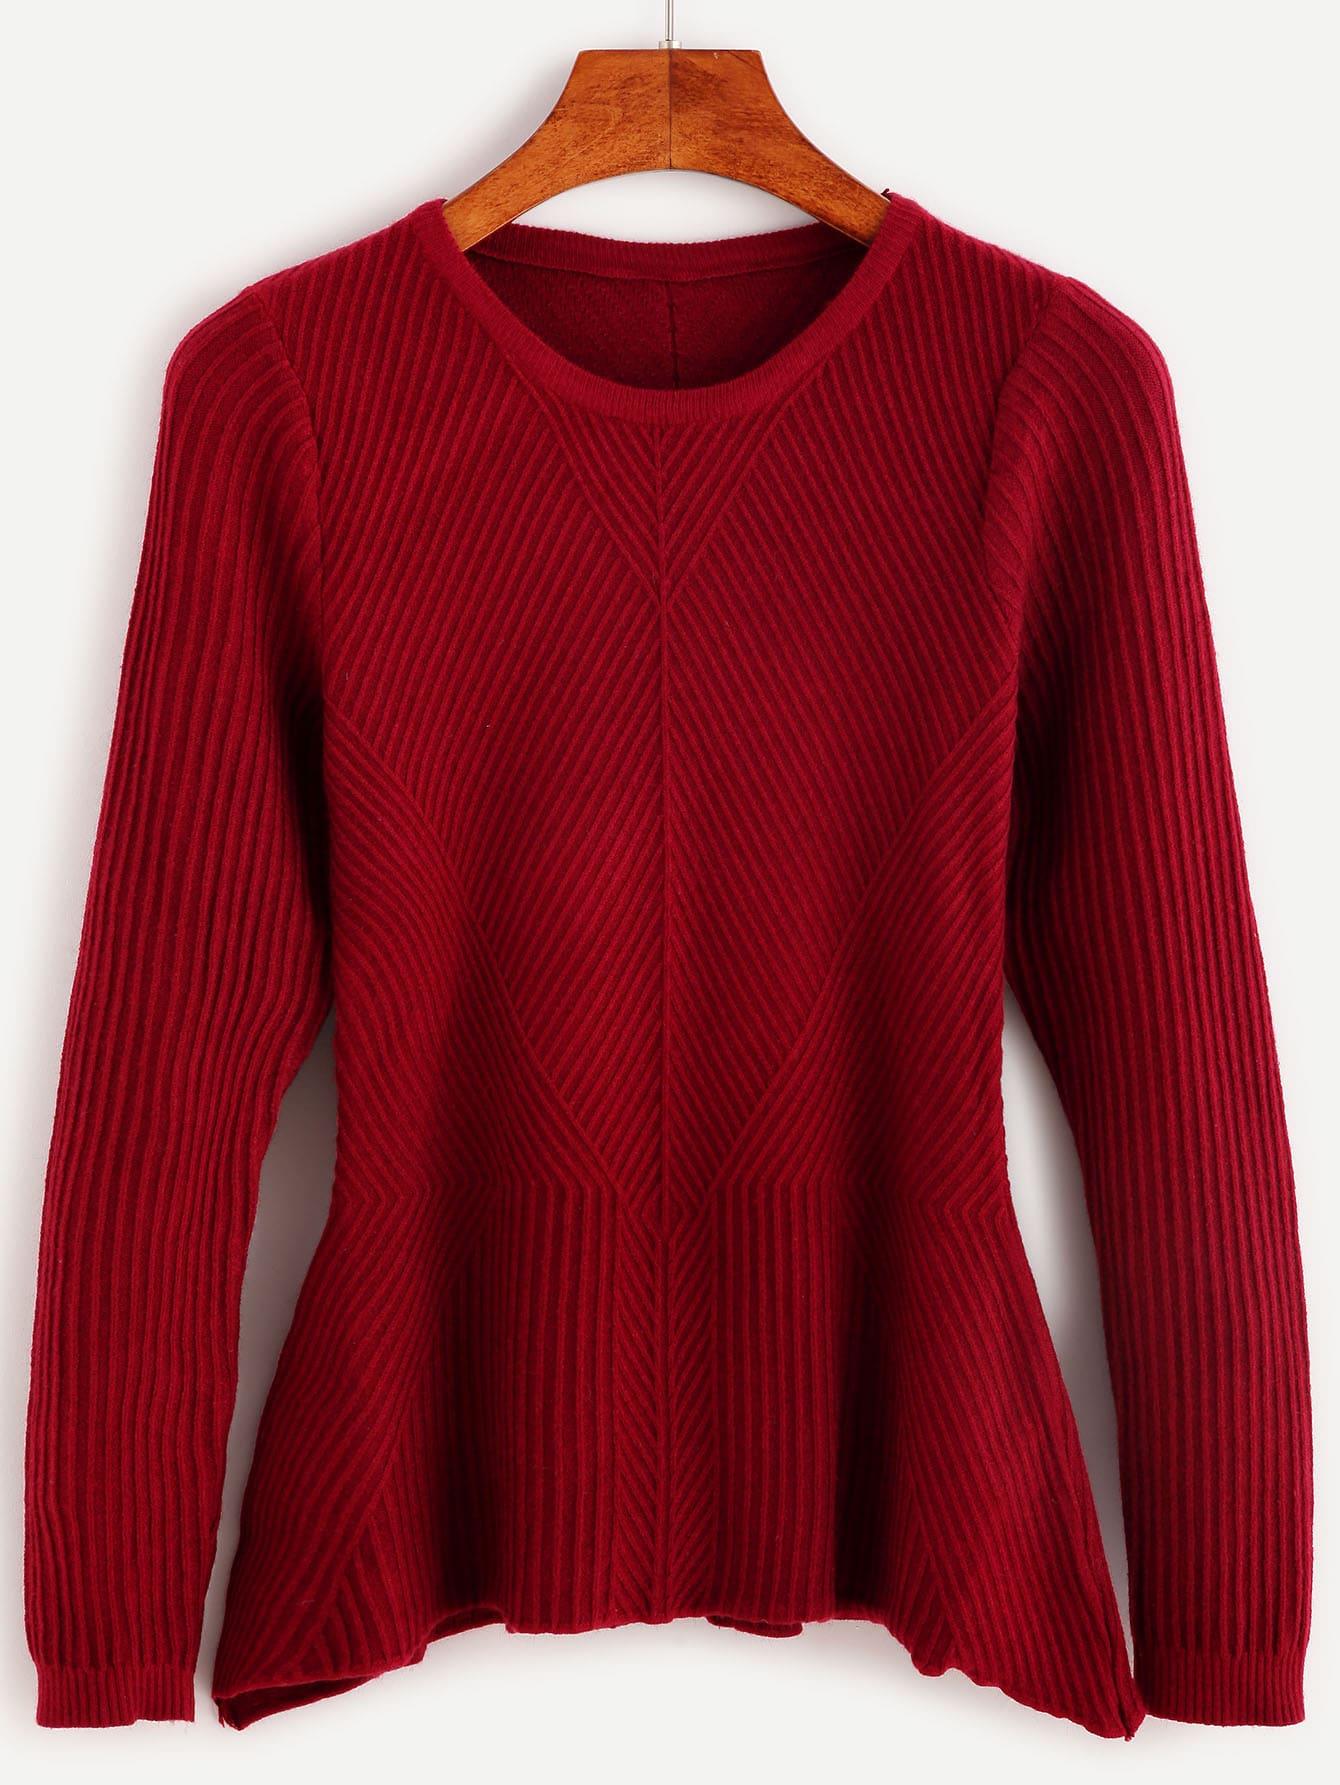 Burgundy Ribbed Peplum Sweater sweater160928105